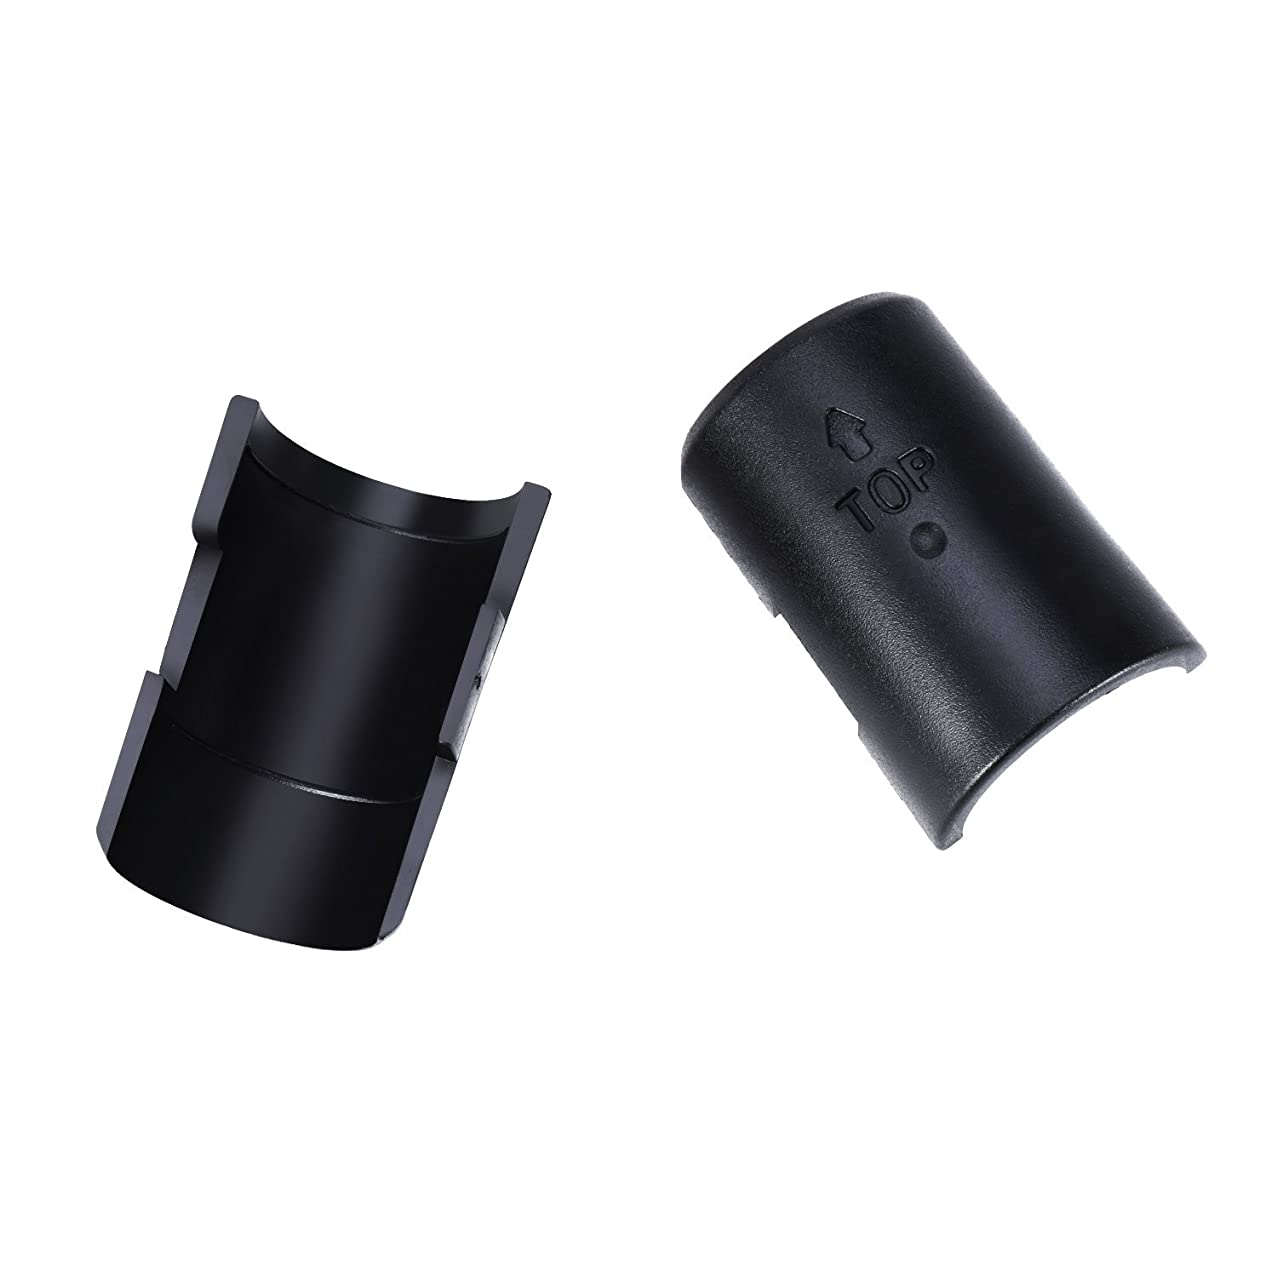 Canomo 32 Pairs Wire Shelf Lock Clips Split Sleeves Shelving Metal Rack Locking for 3/4 Inch Diameter Post Shelving Sleeves, Black